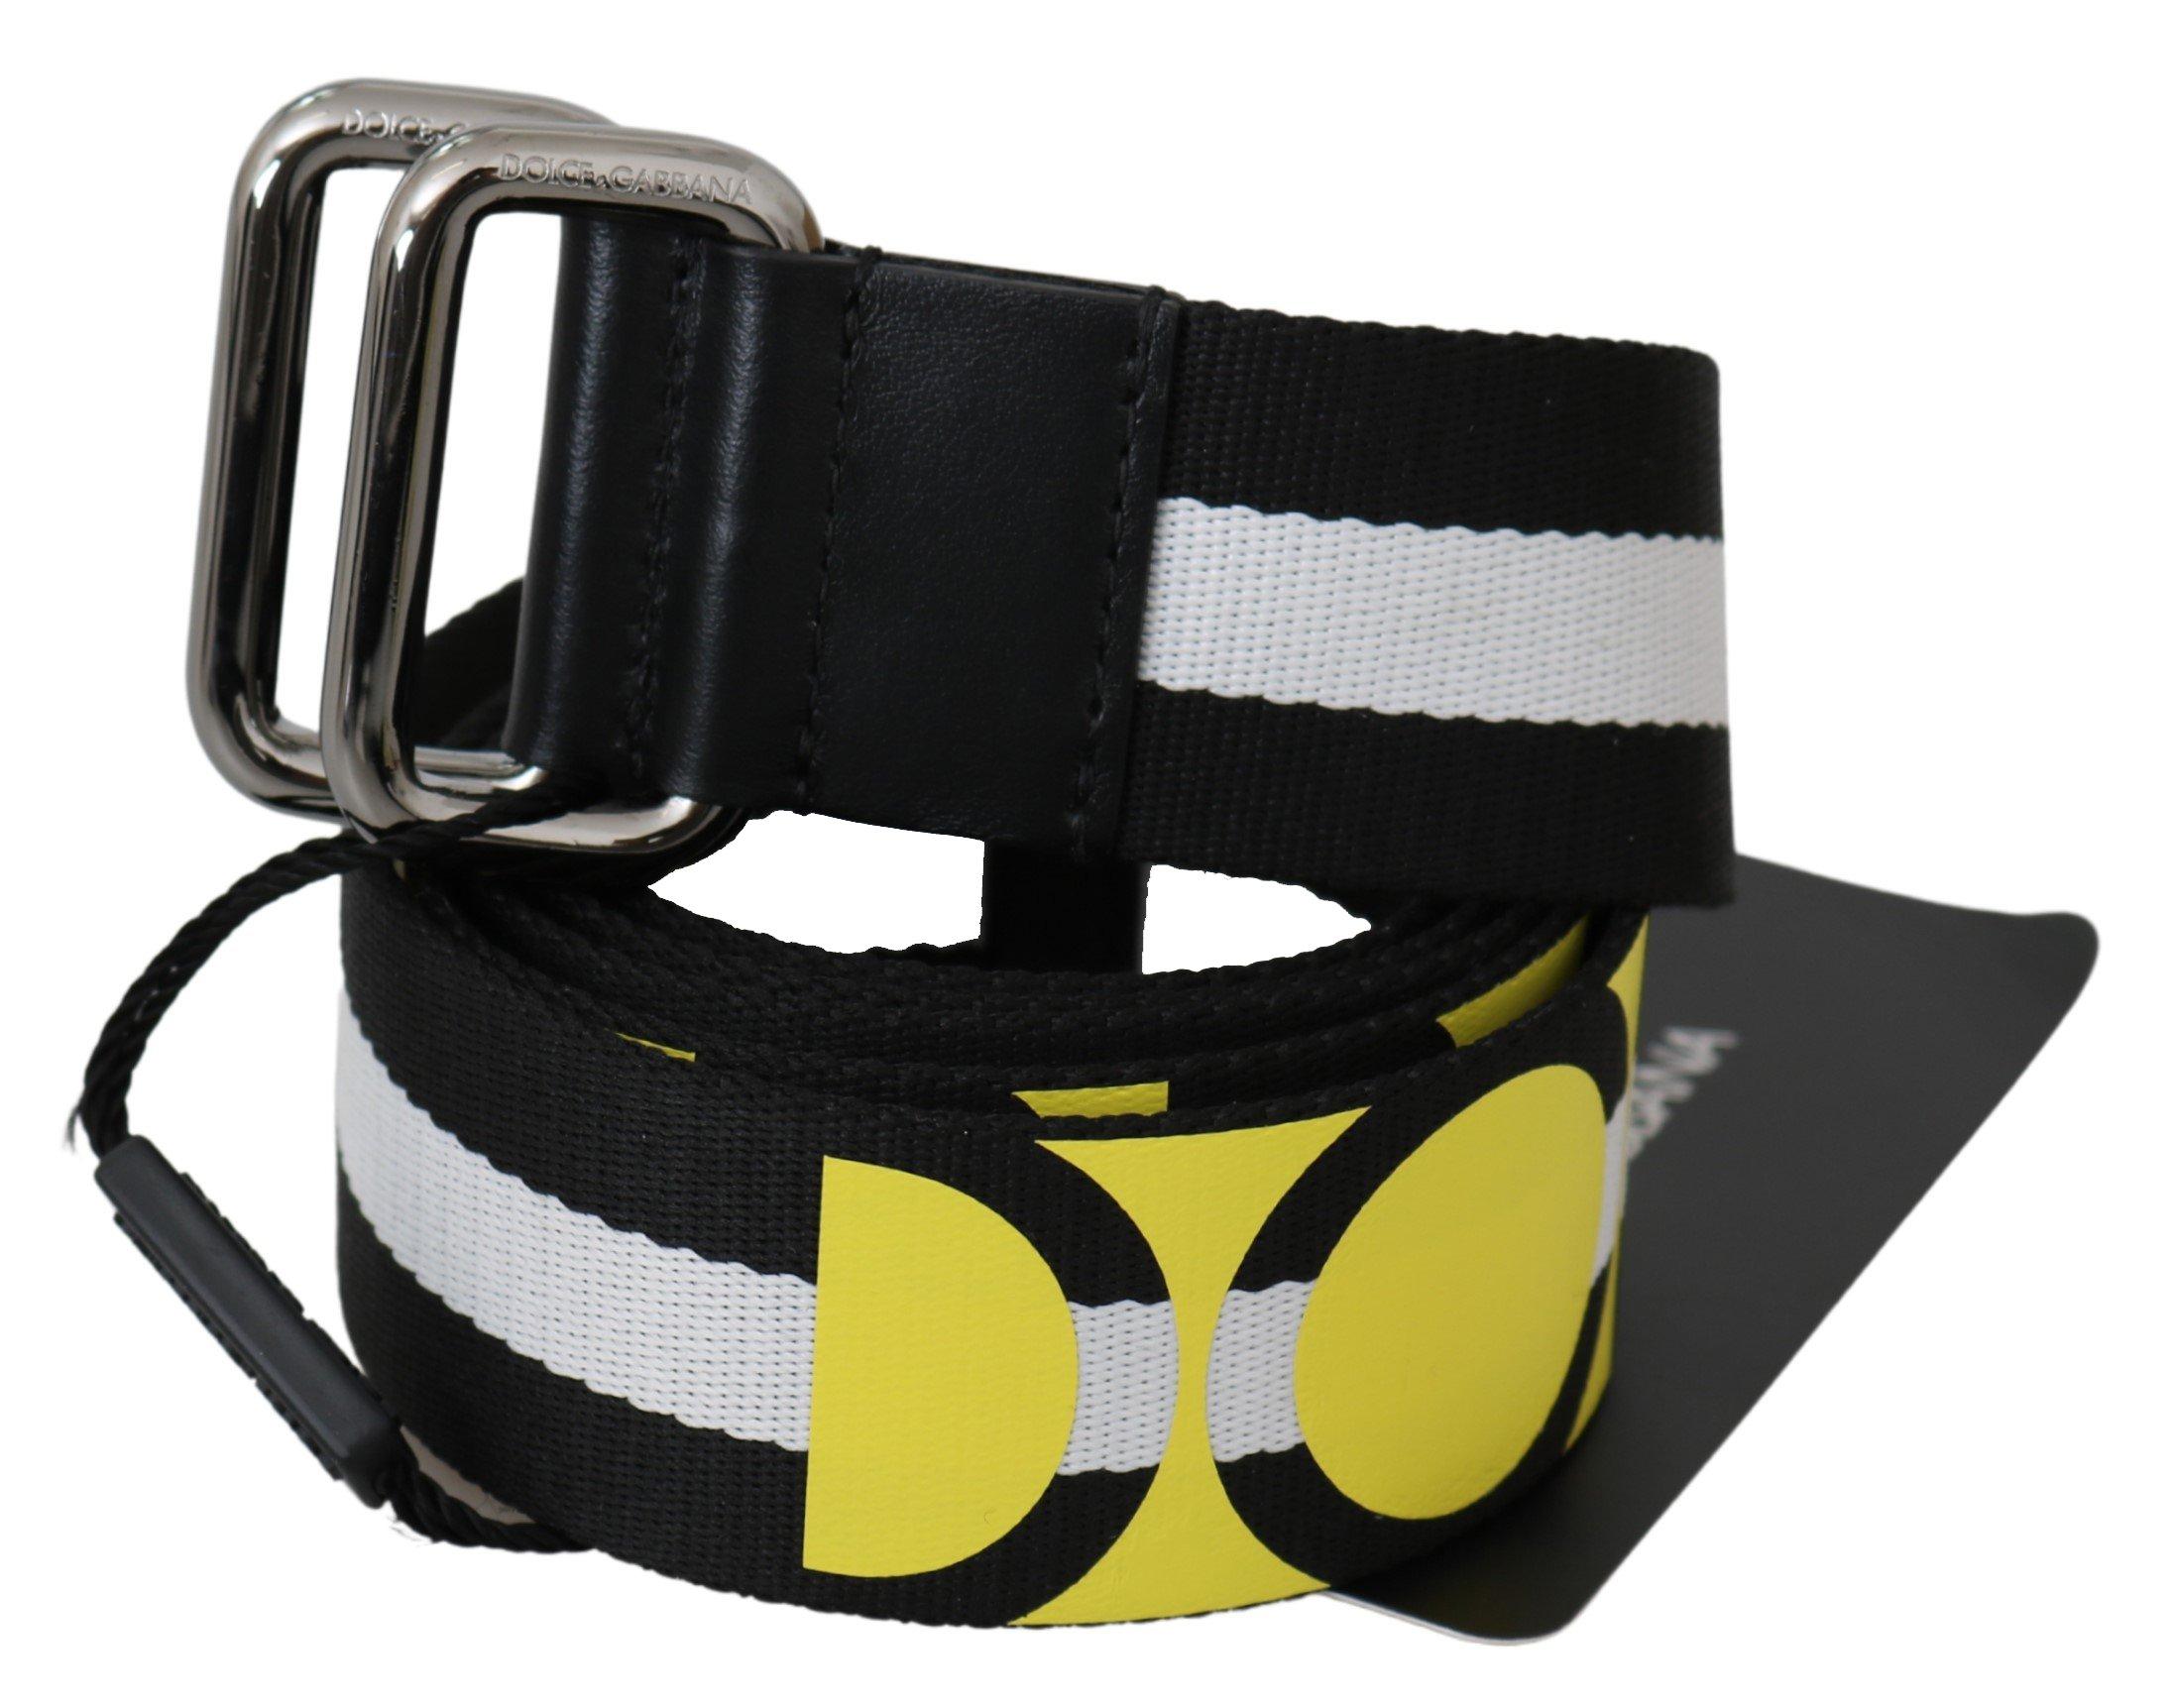 Dolce & Gabbana Men's Nylon Logo Stripe Belt Black BEL60701 - 95 cm / 38 Inches